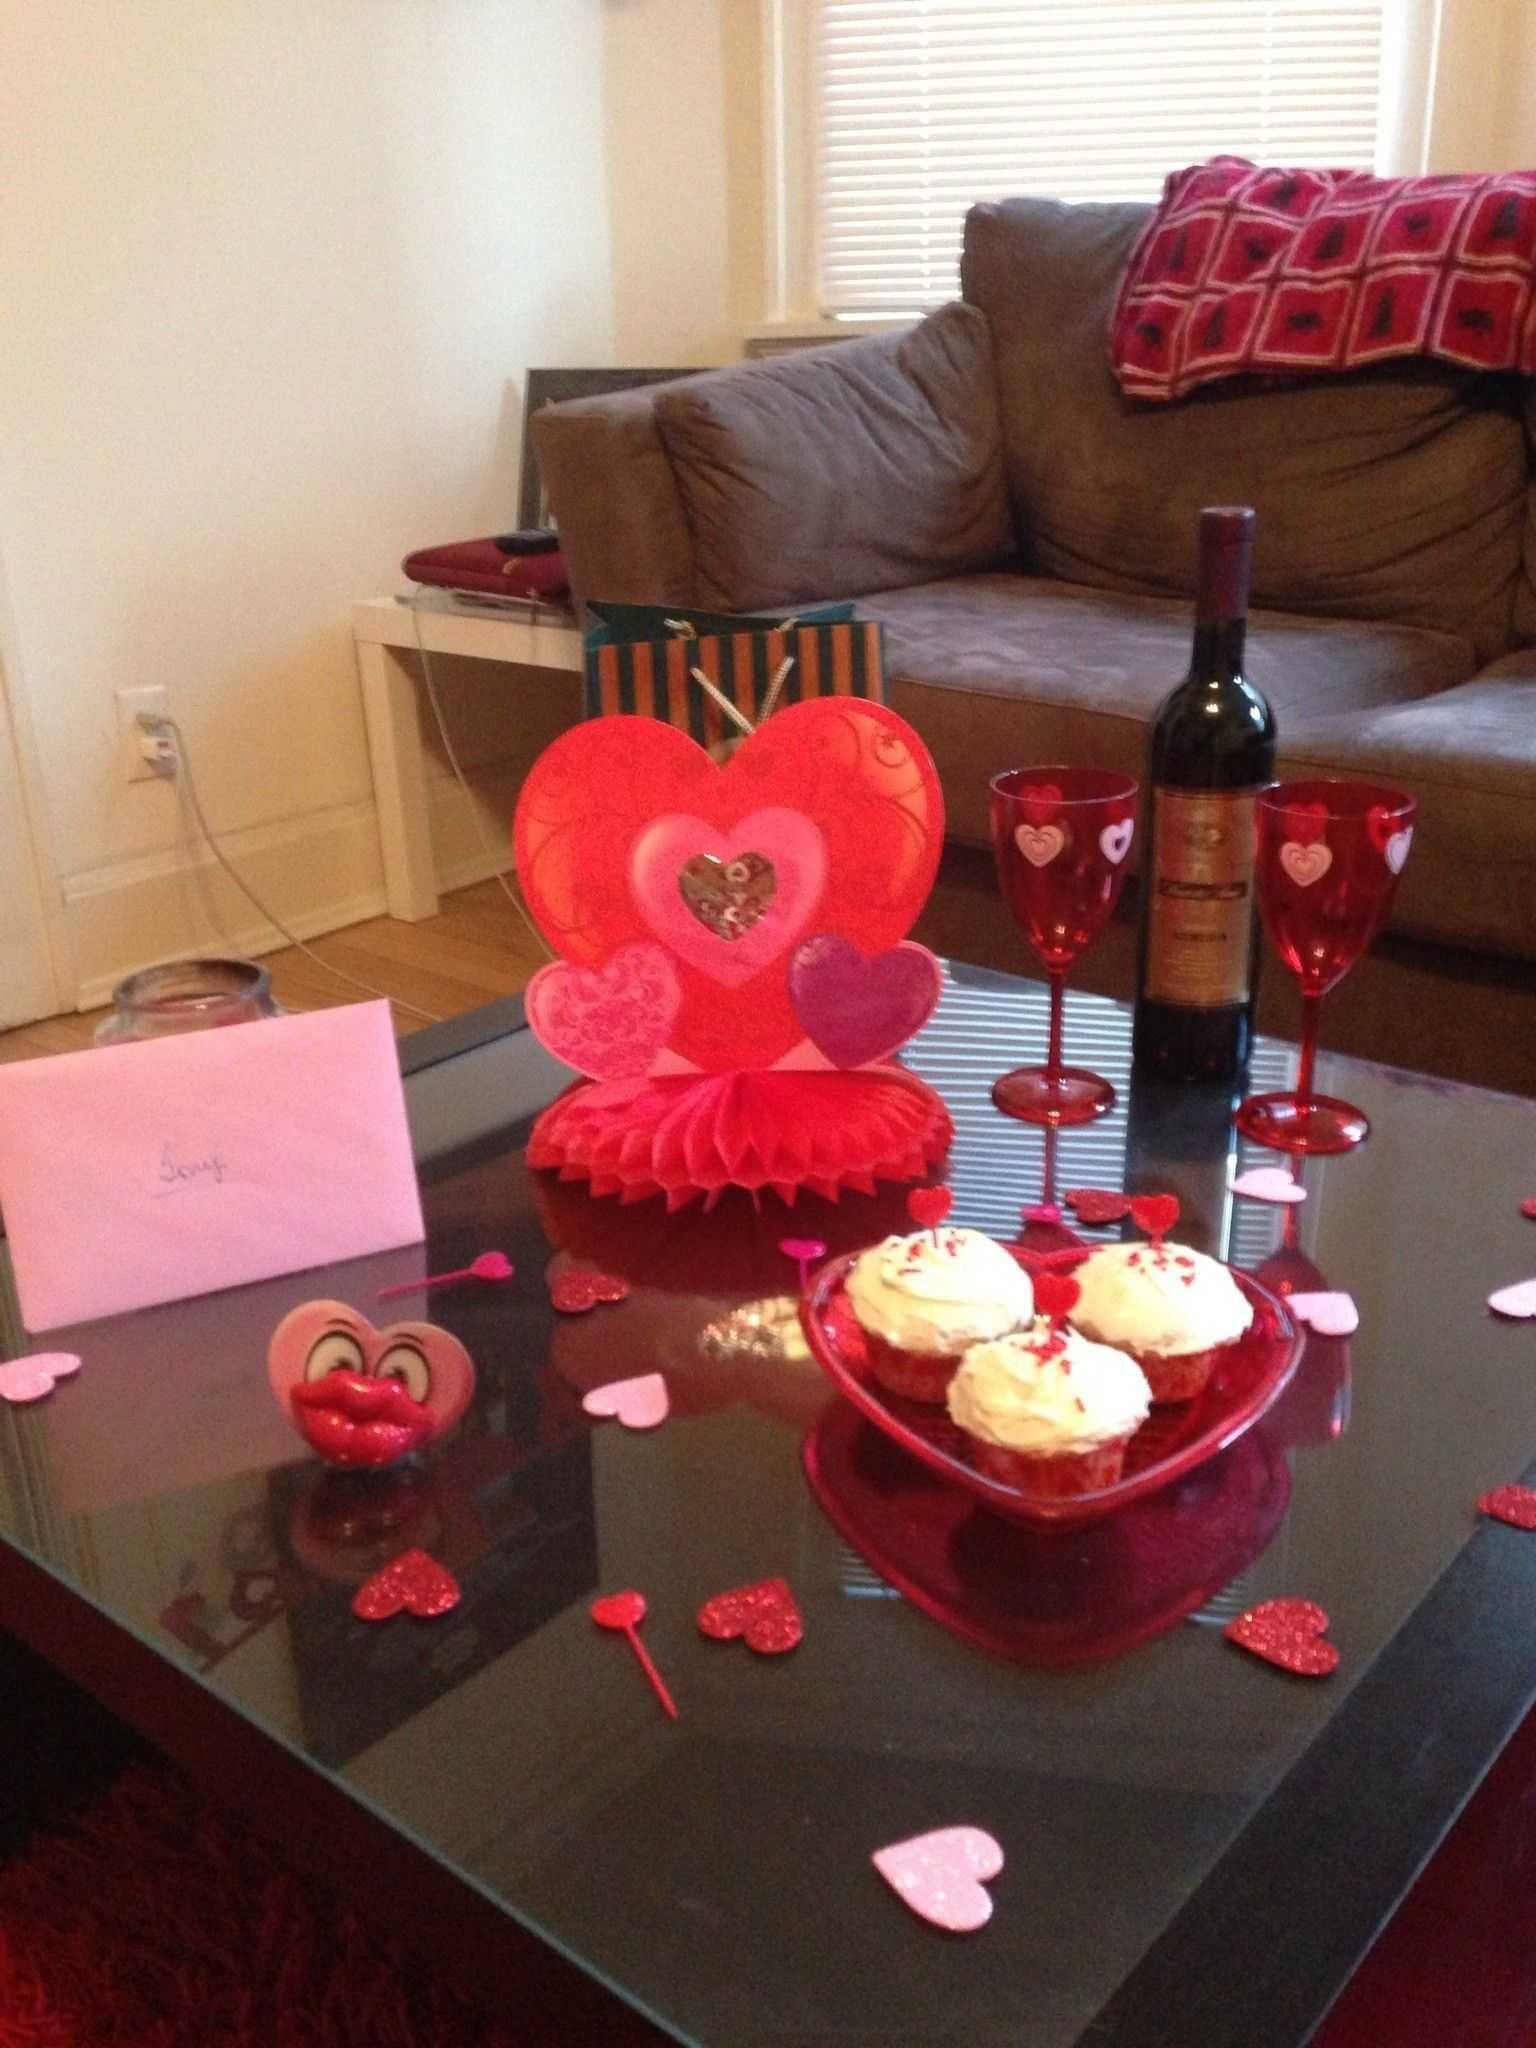 25 Beautiful Romantic Bedroom Ideas For Valentines Manlikemarvinsparks Com Valentine Table Decorations Valentine Decorations Diy Valentines Decorations